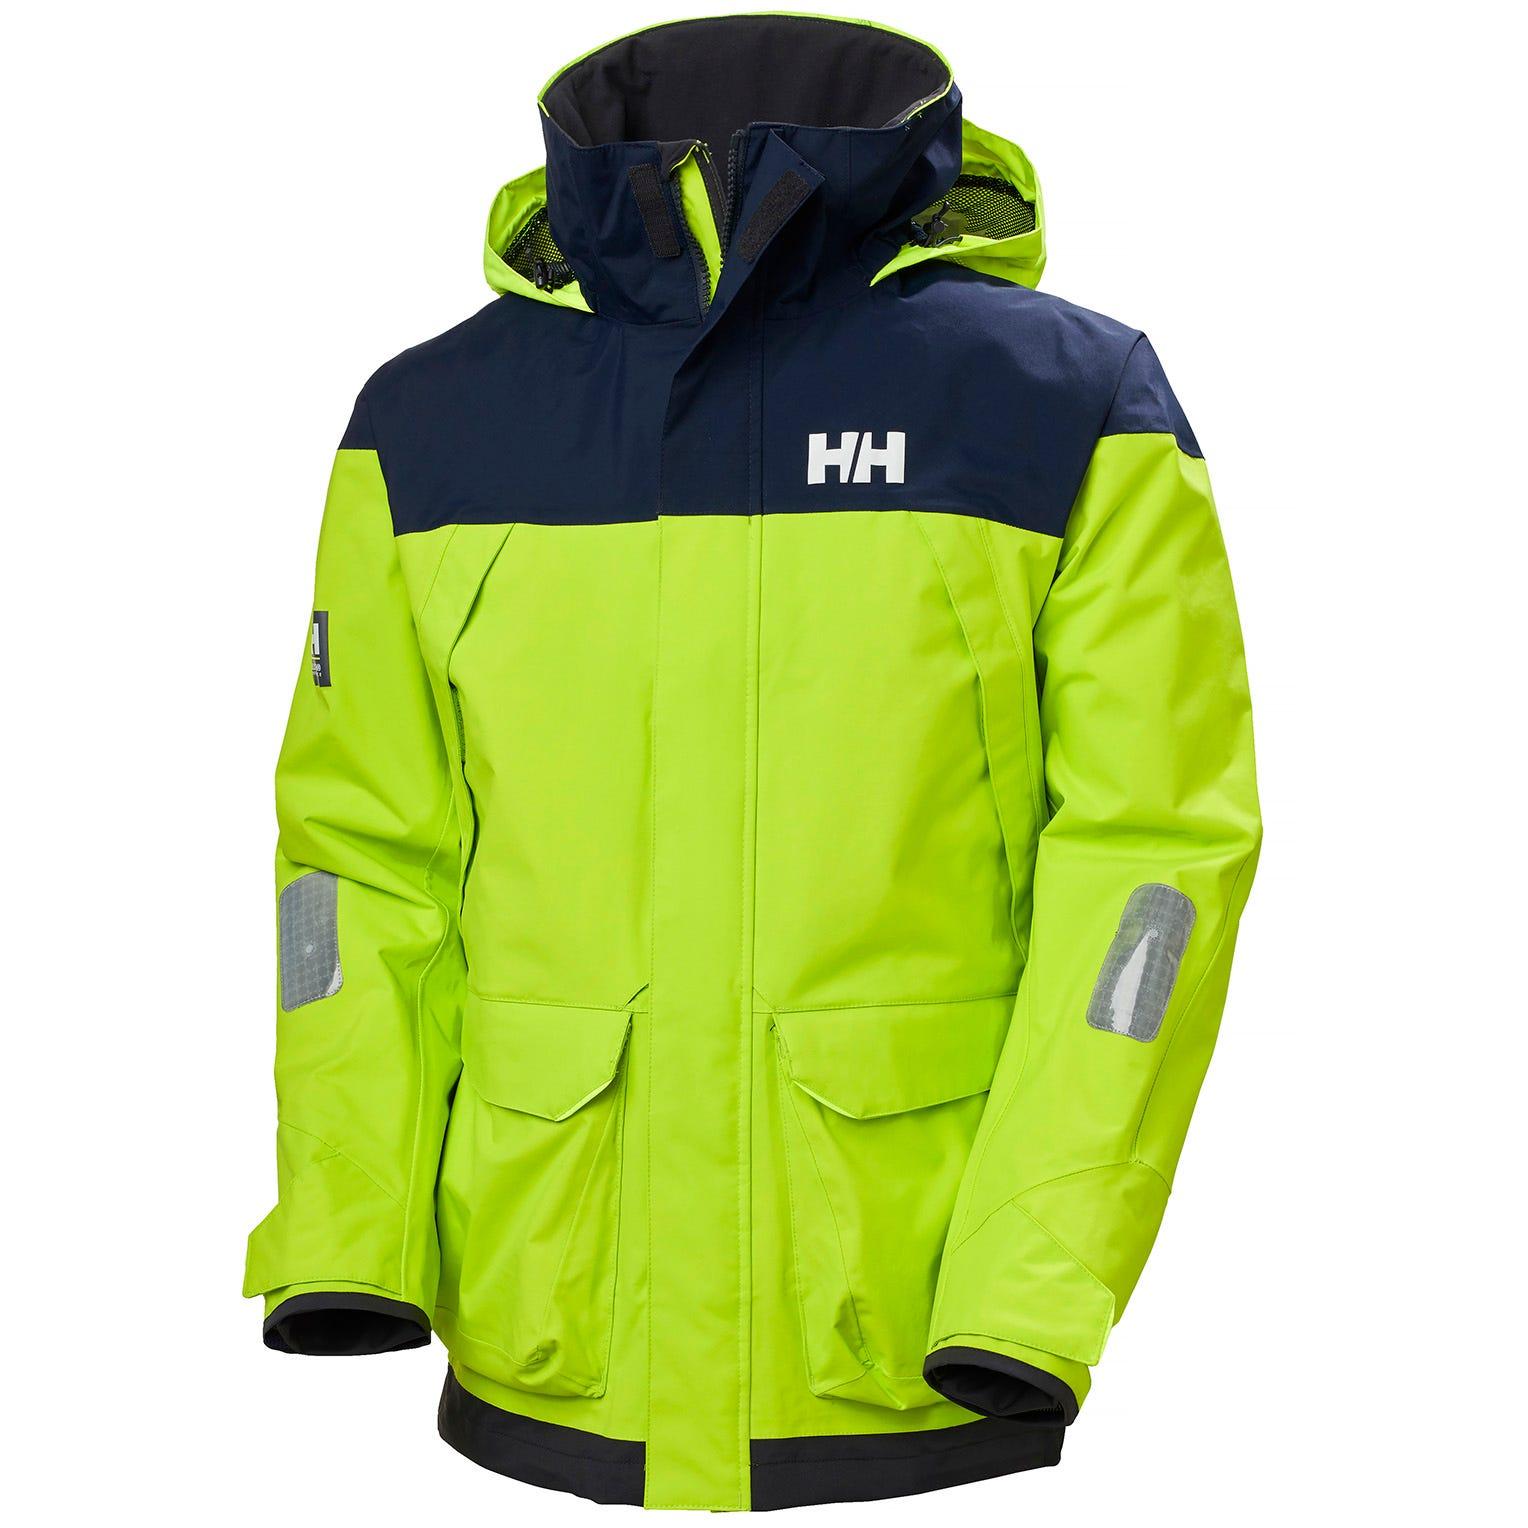 Helly Hansen Mens Pier 3.0 Coastal Sailing Jacket Green S